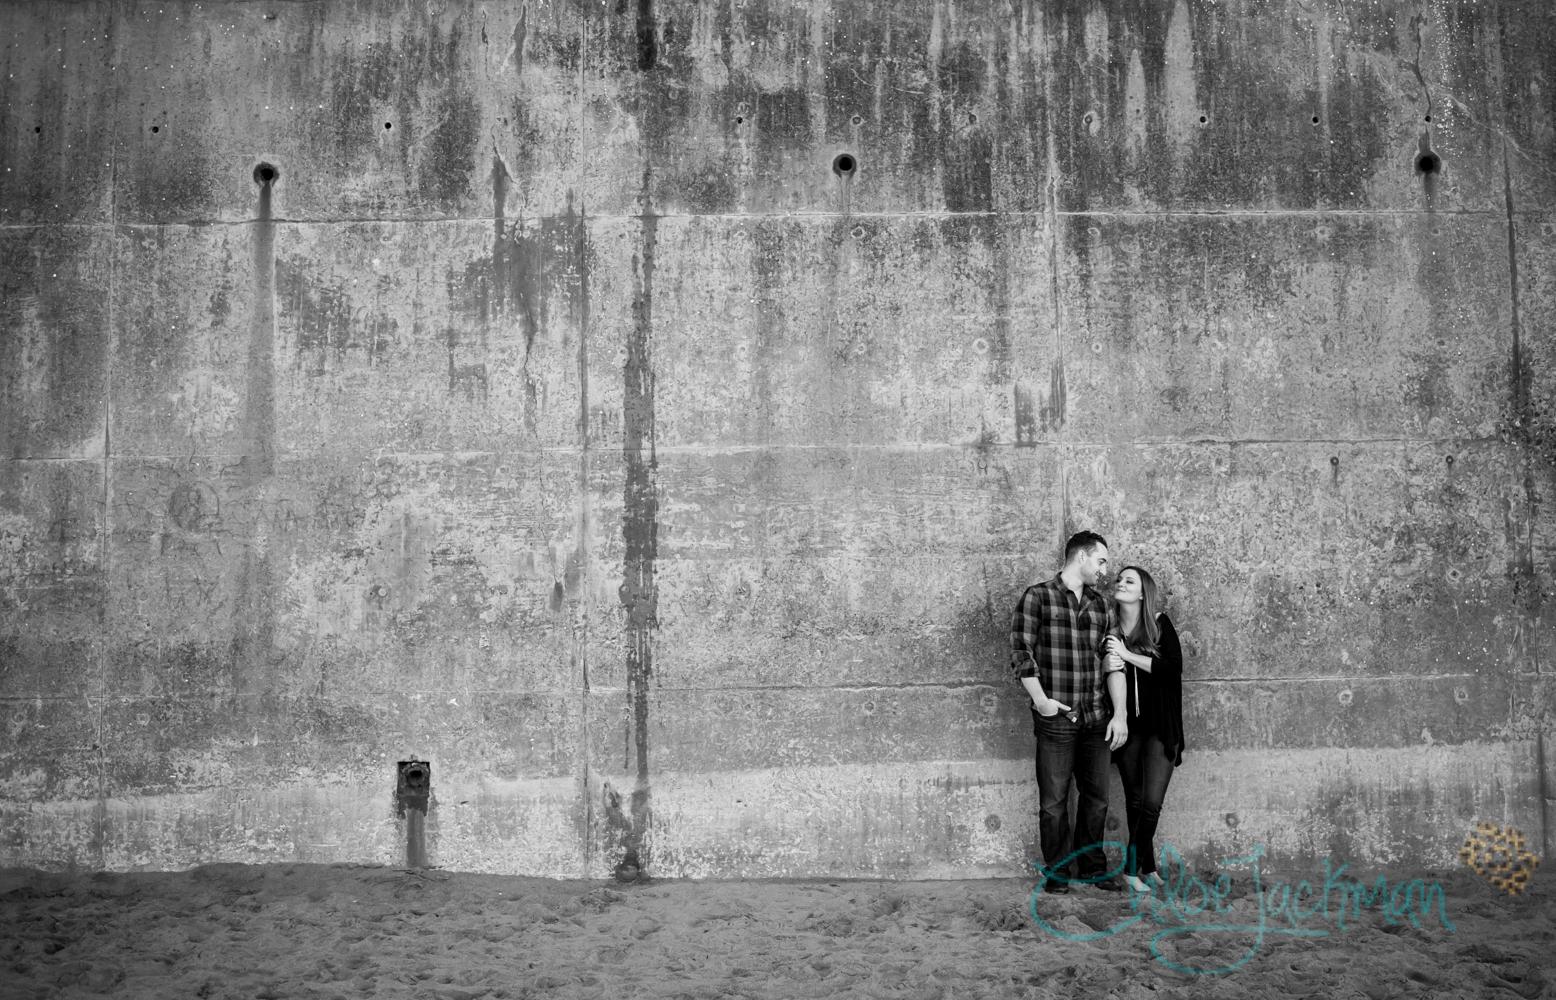 Chloe-Jackman-Photography-Golden-Gate-Park-Engagement-Session-2014-290